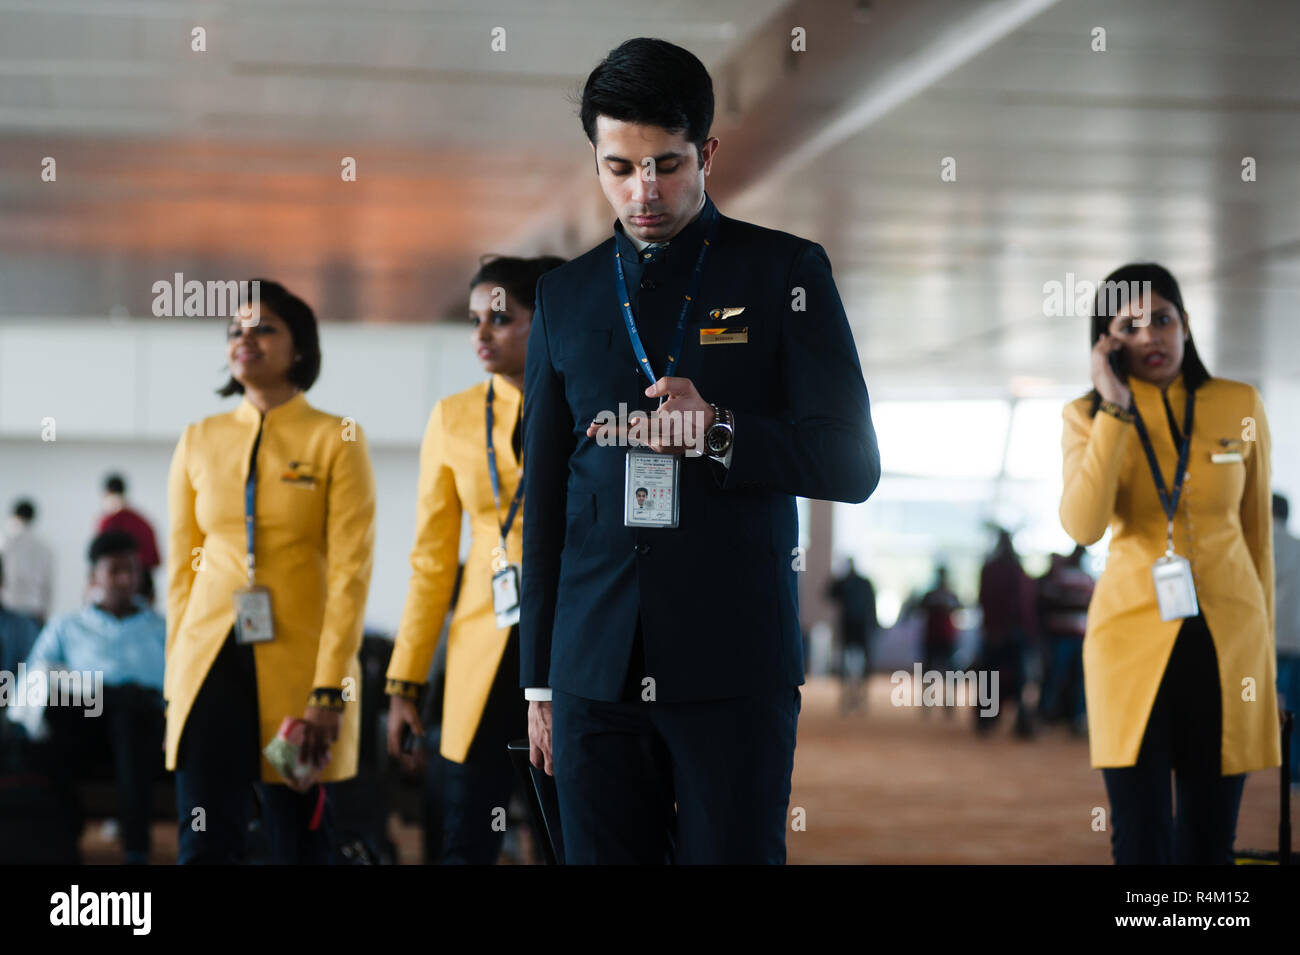 Photo of Jet Airways team of pilot and stewardesses going to flight. India, Indira Gandi Delhi Airport - 7 february 2018. - Stock Image